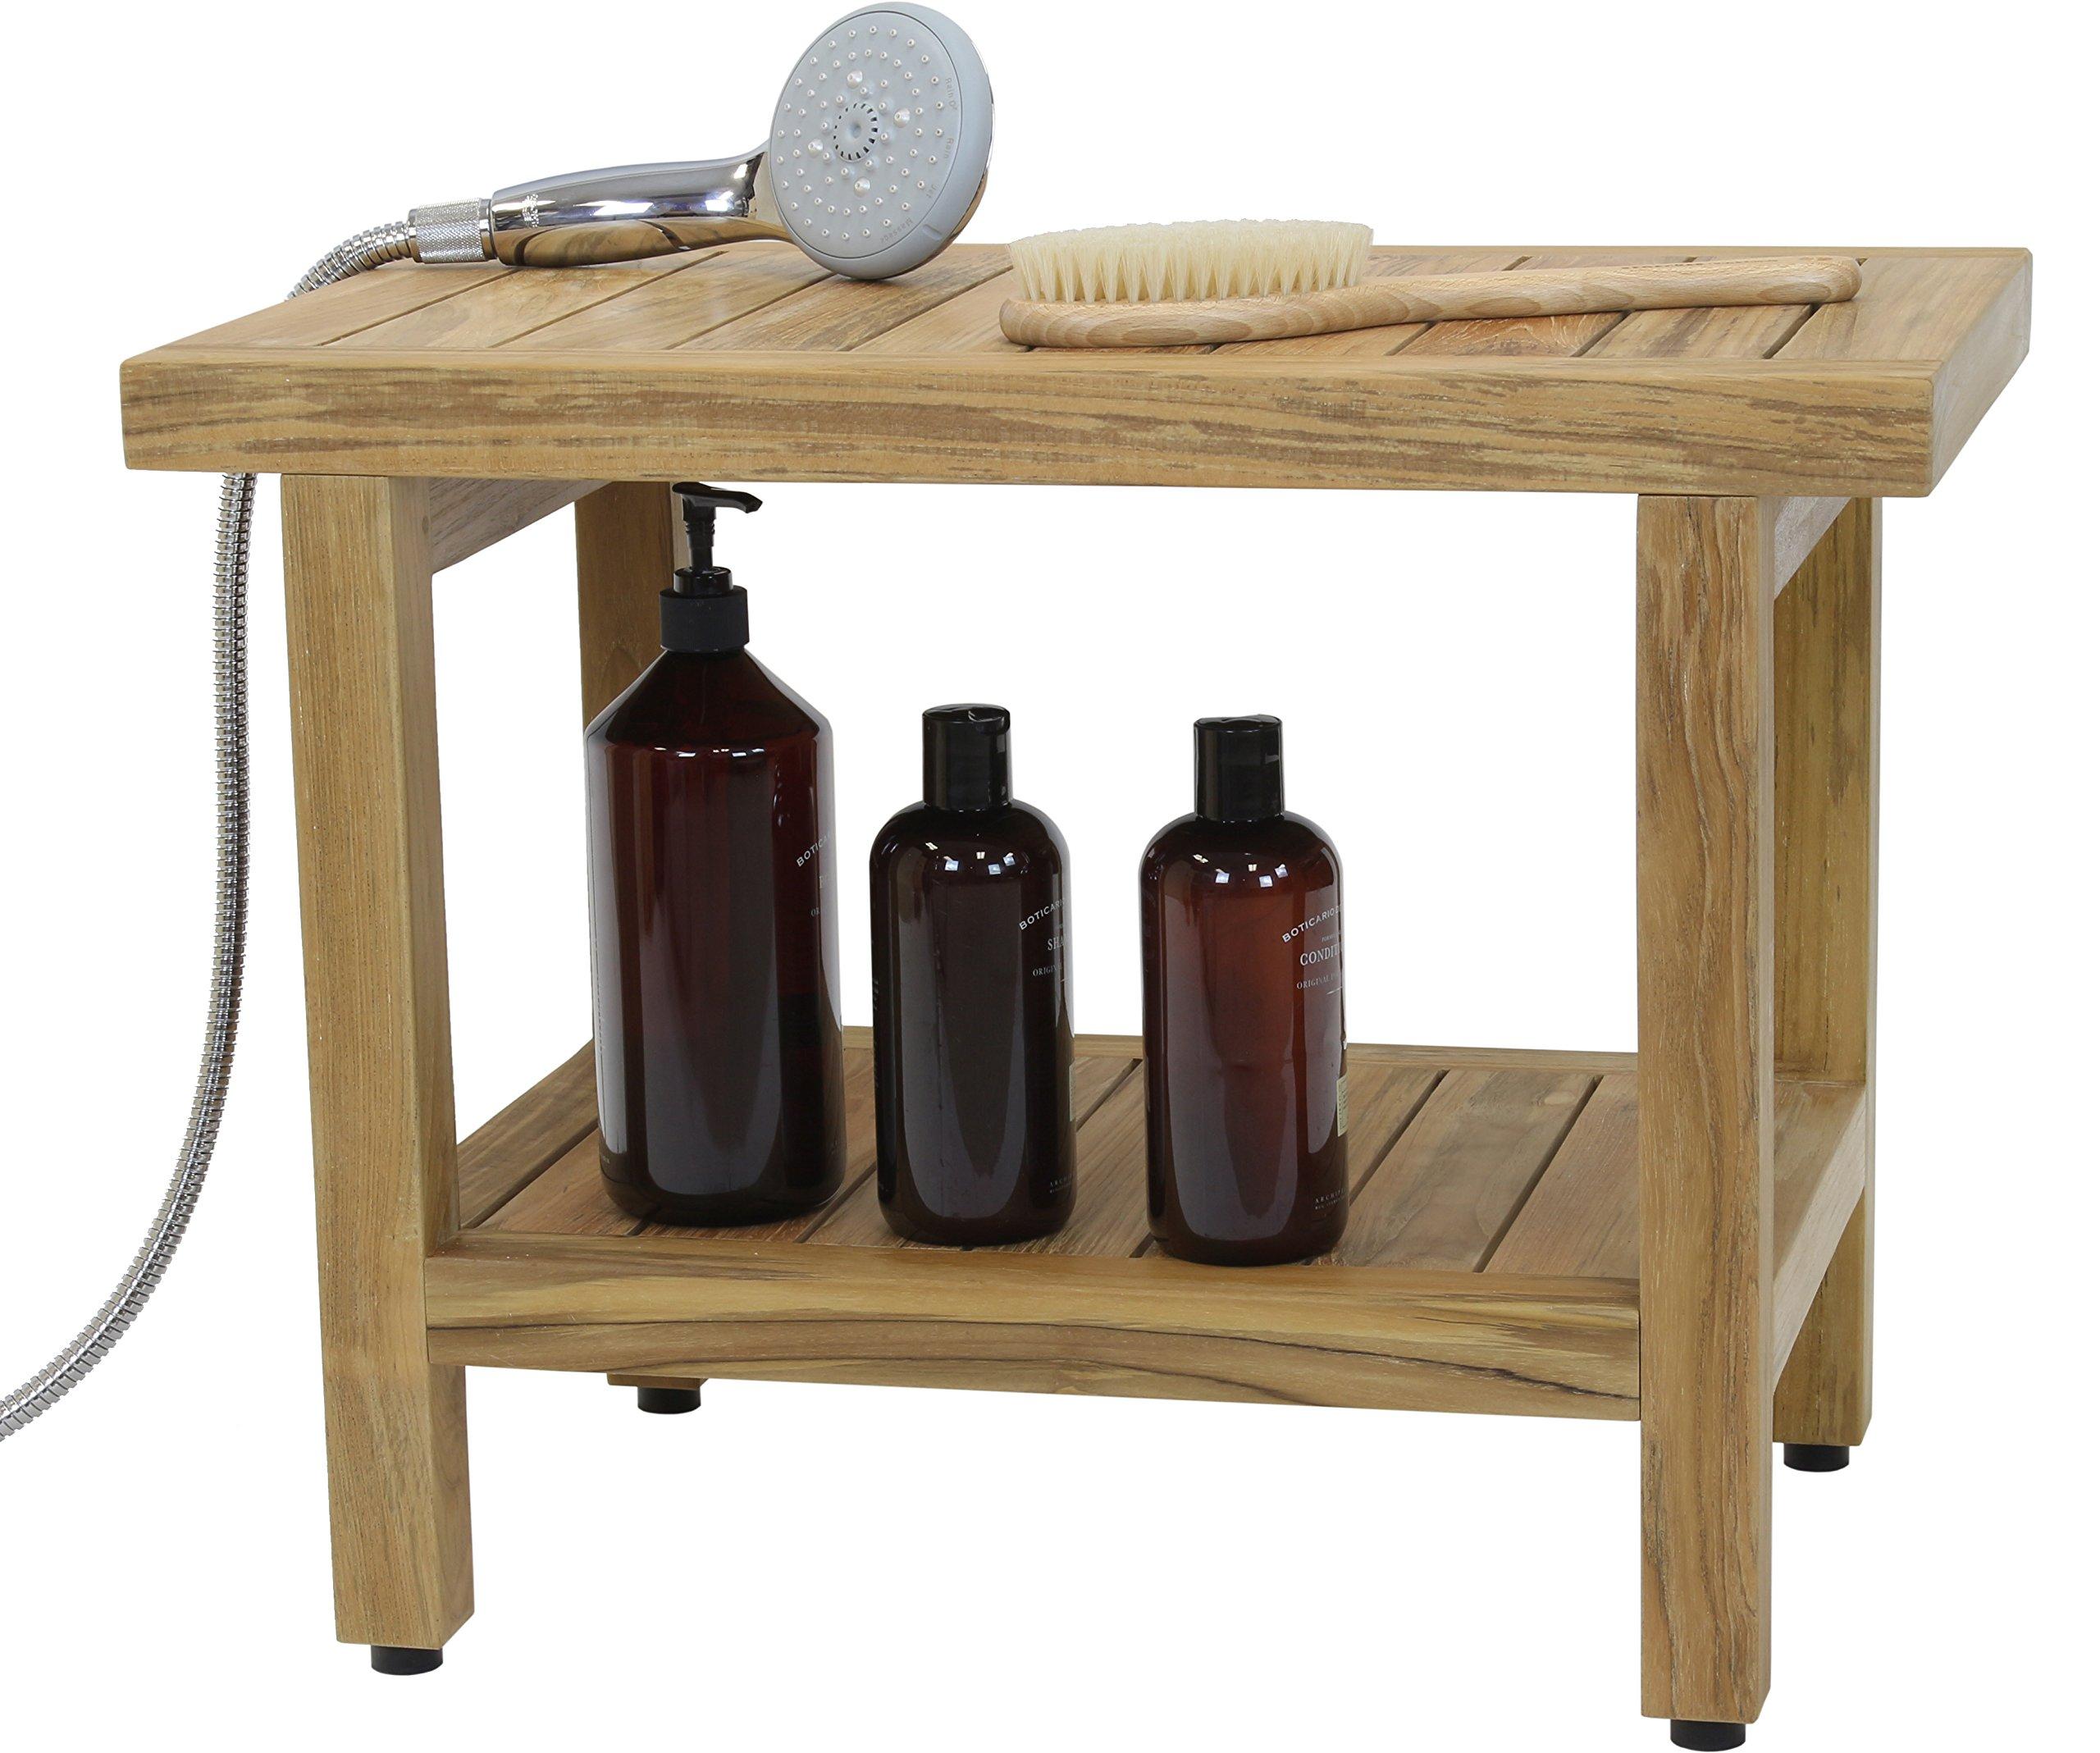 24'' Spa Natural Teak Shower Bench with Shelf by AquaTeak (Image #5)